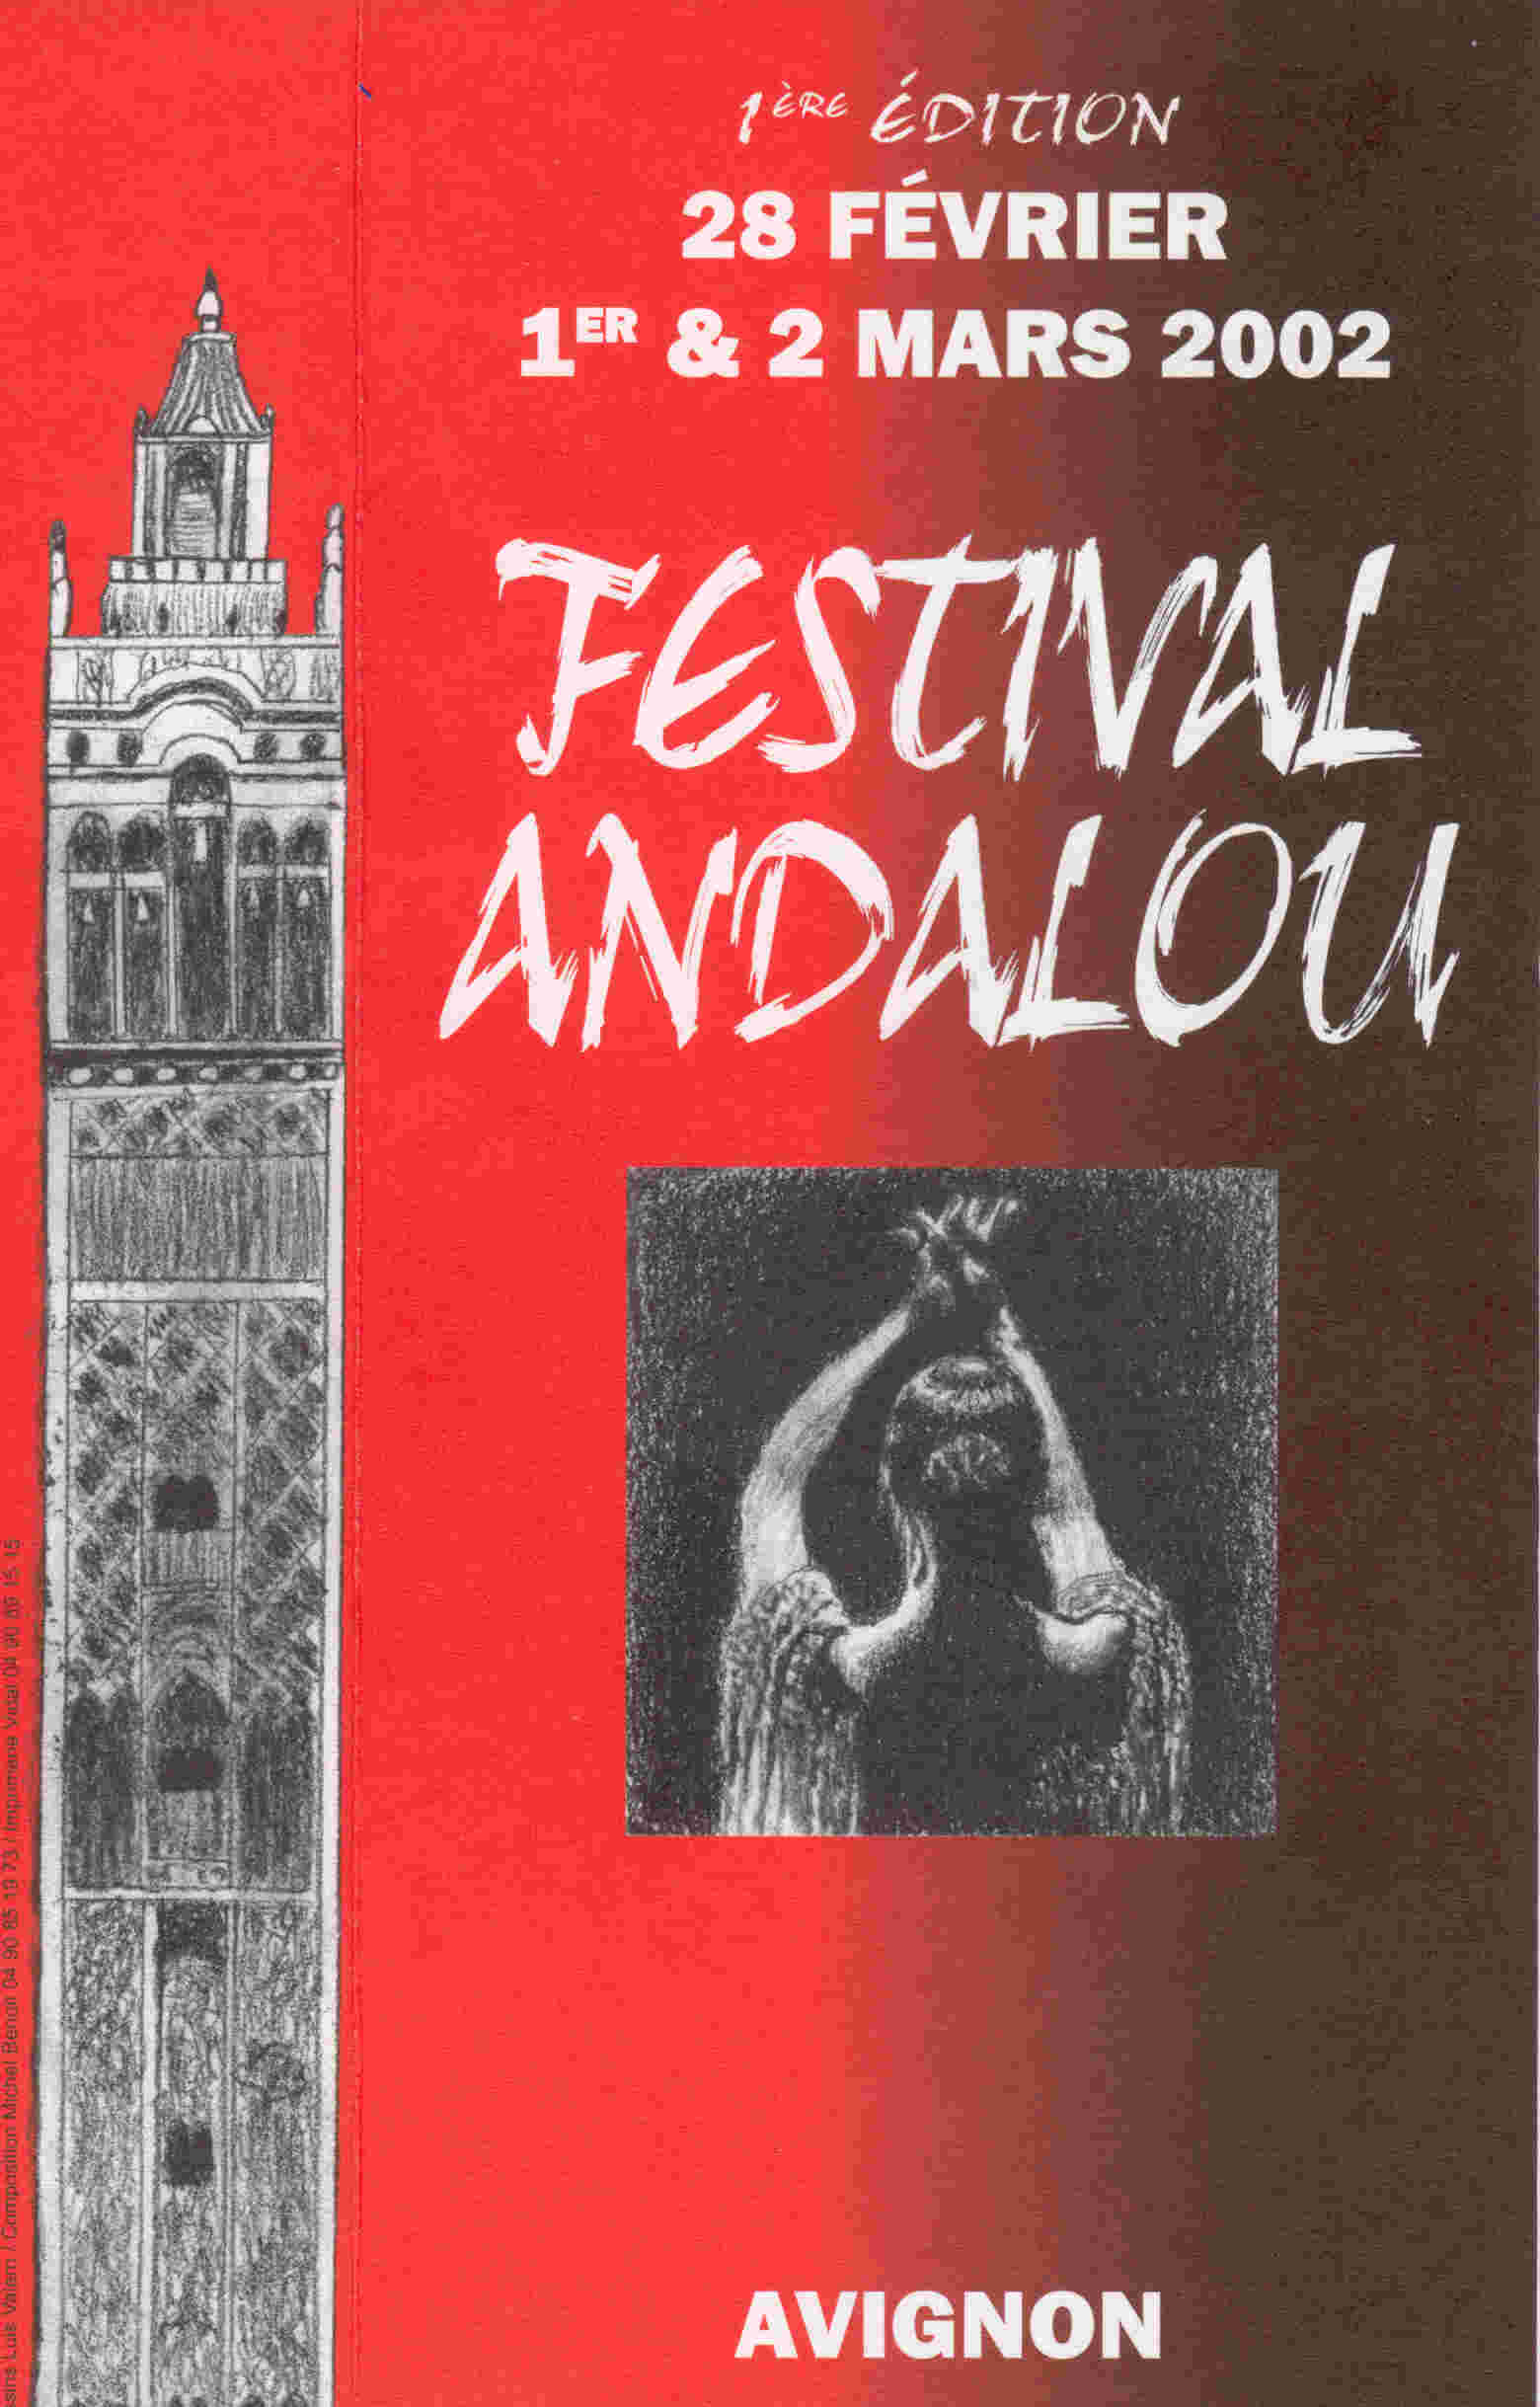 Festival Andalou